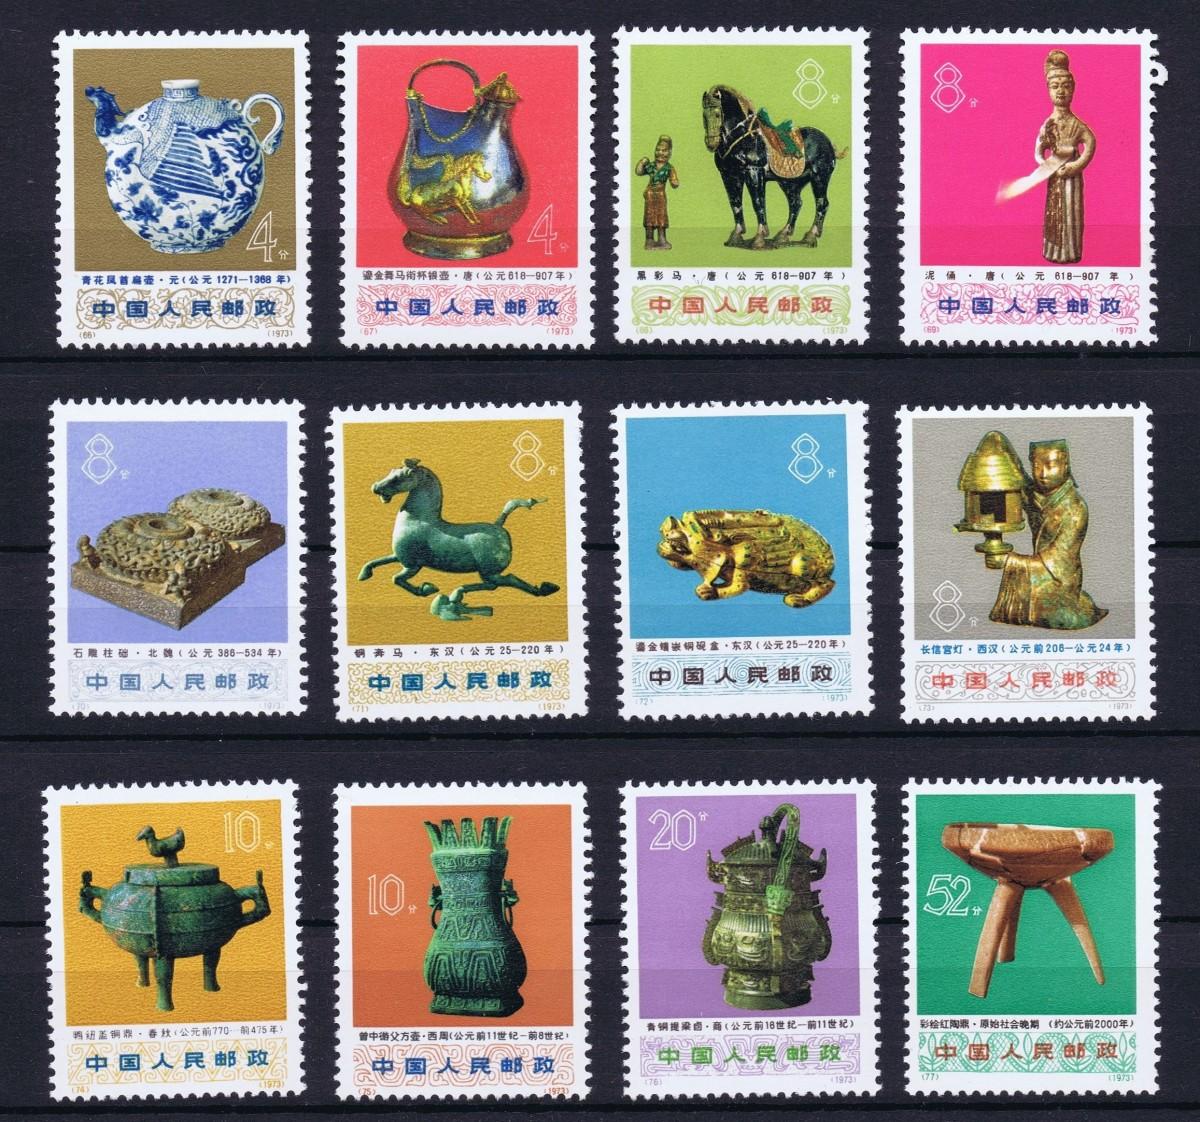 postage_stamps_china_post-624384.jpg!d.jpg